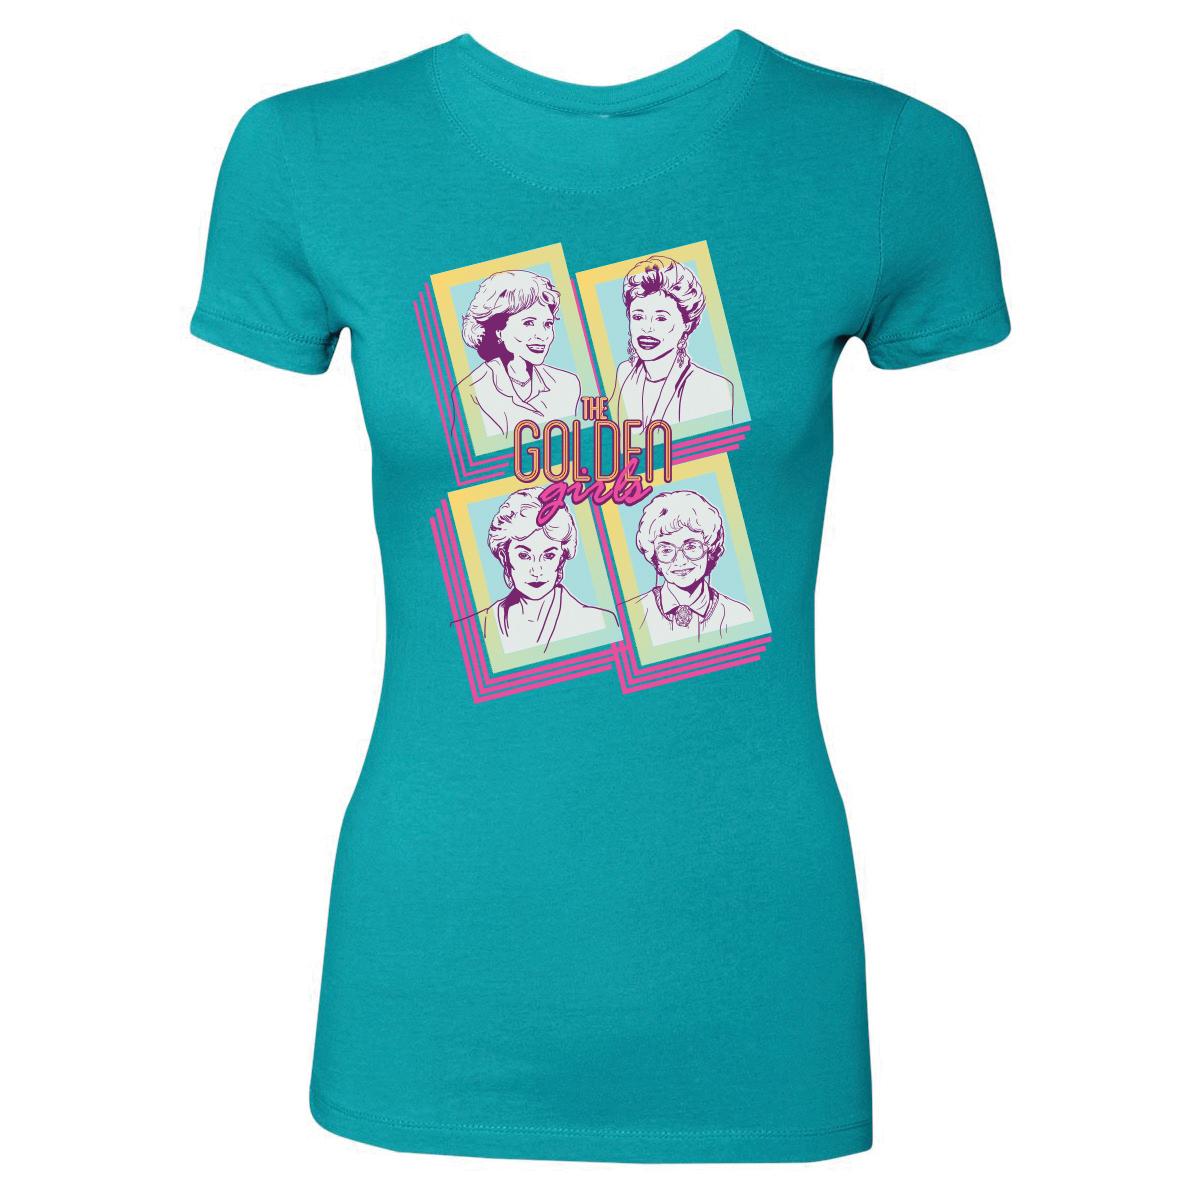 The Golden Girls Retro Women's T-Shirt